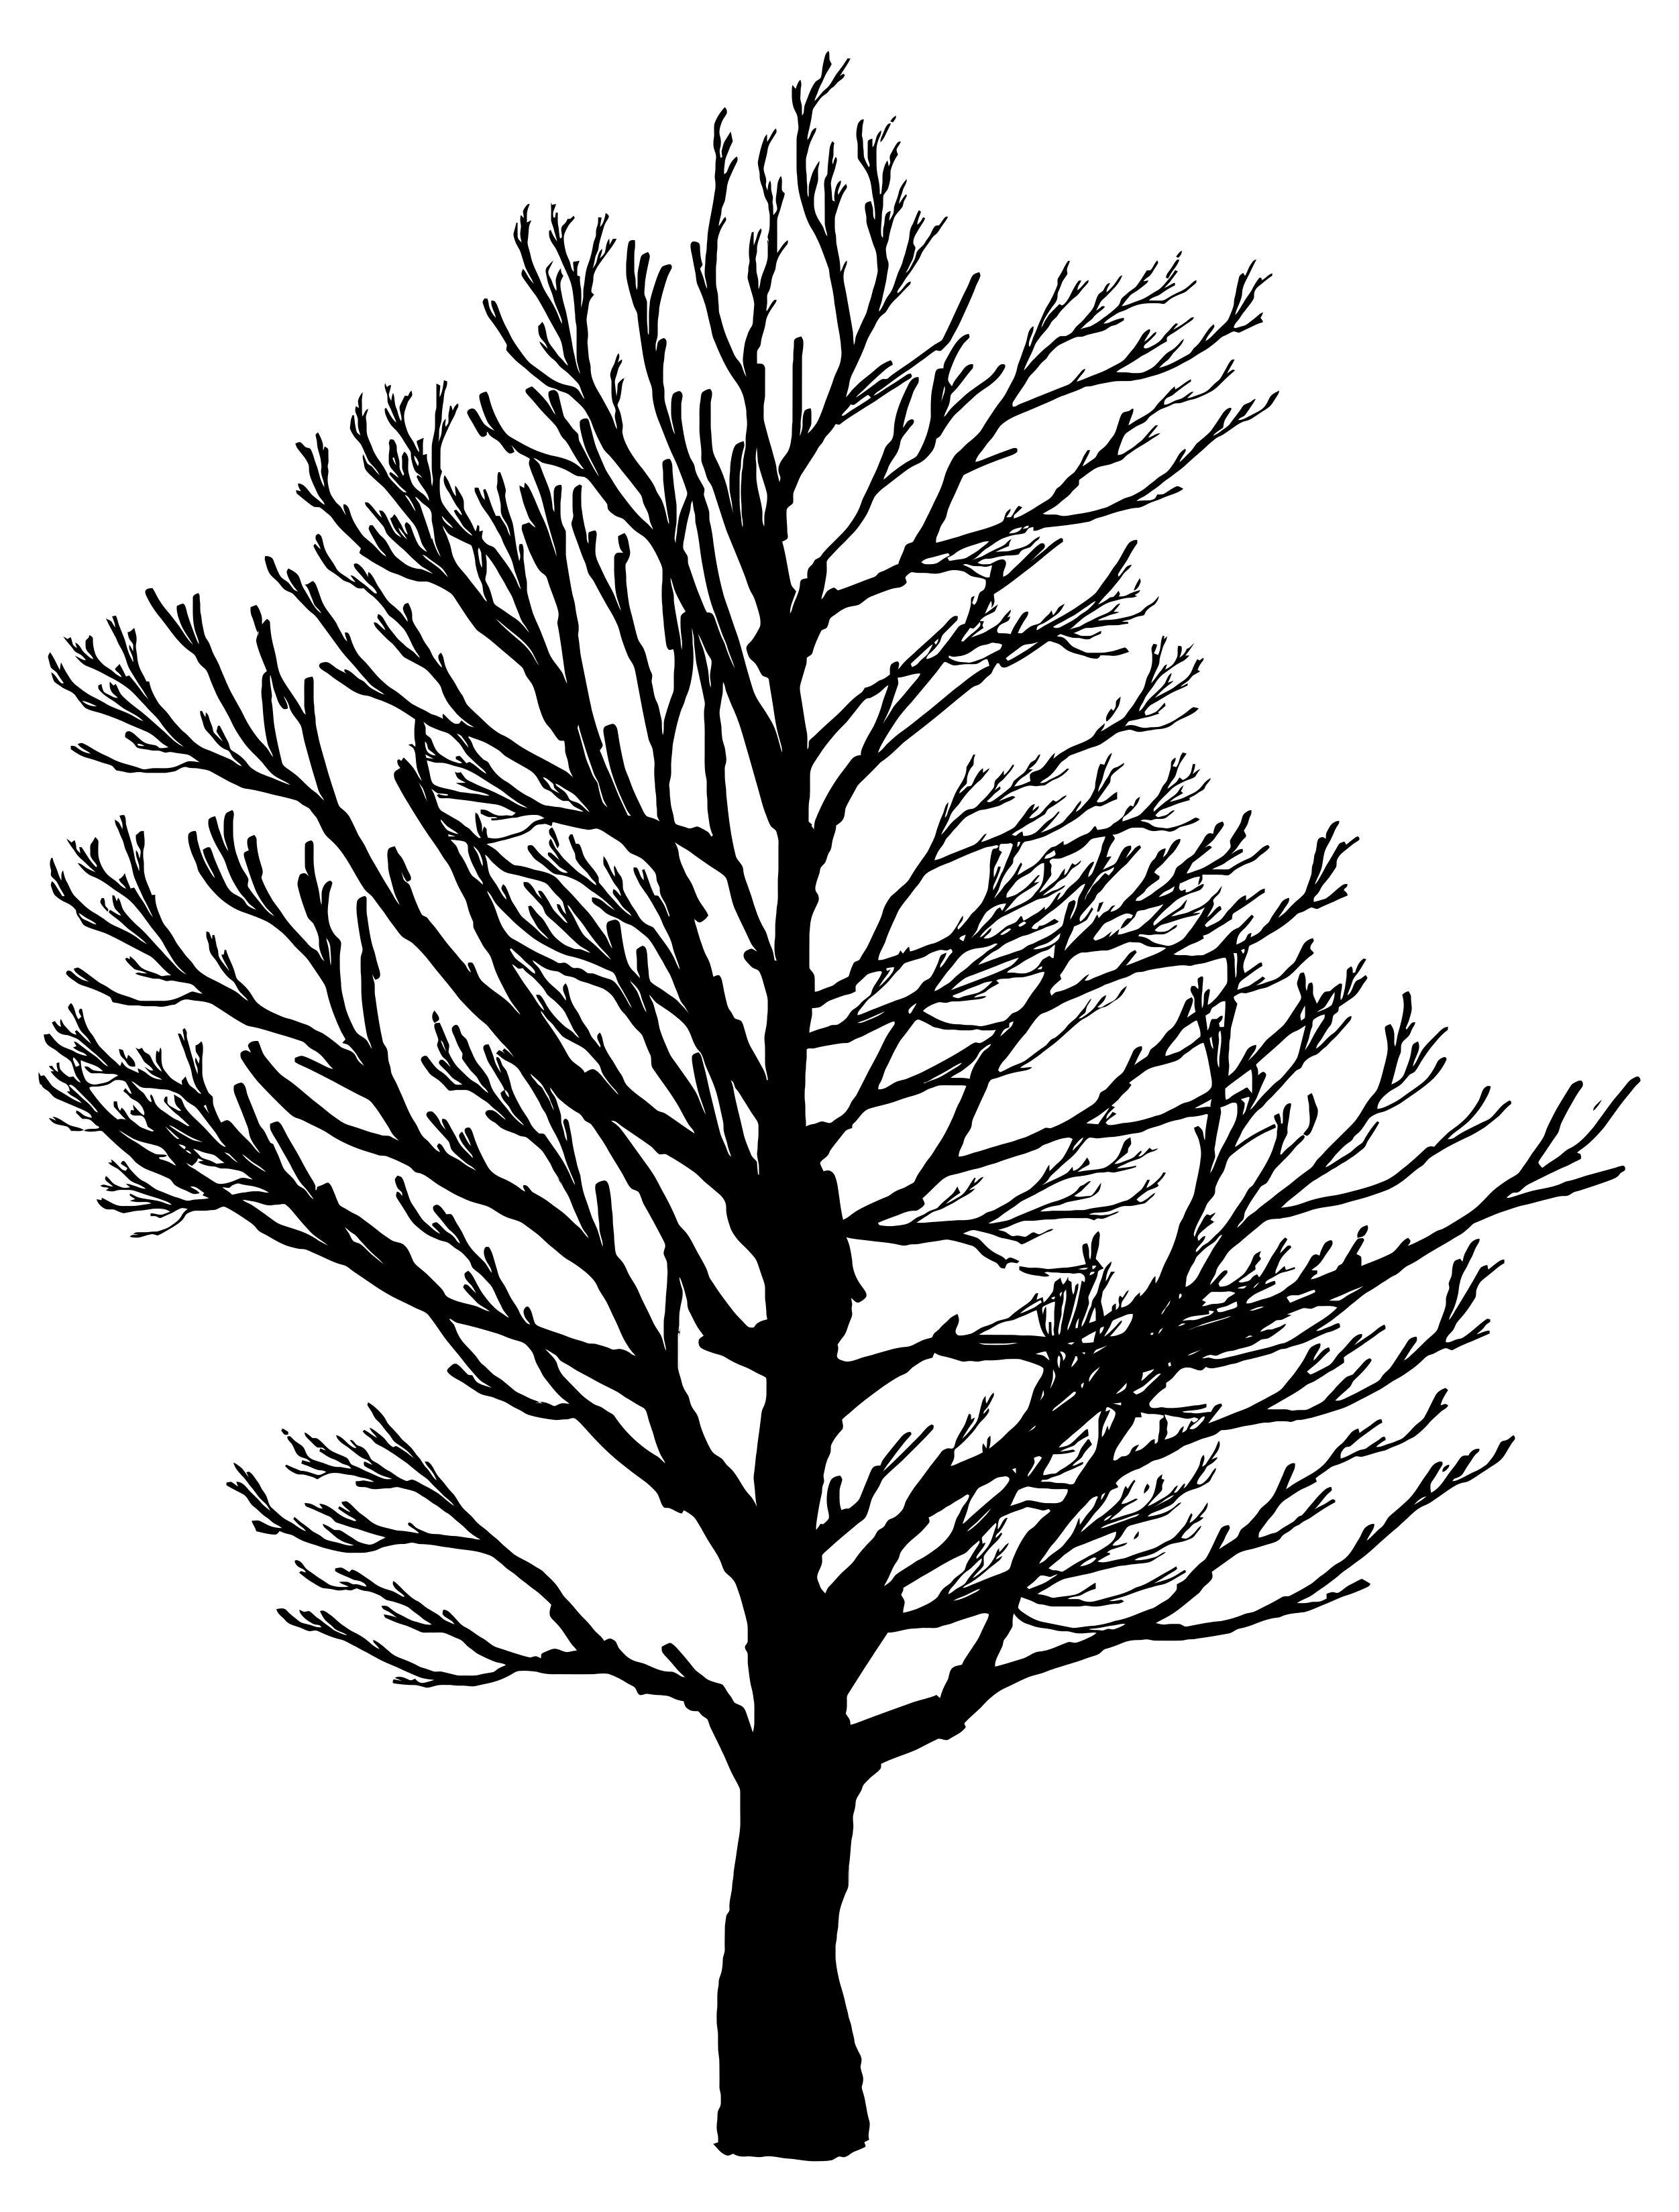 2503x3298 Barren Tree Silhouette 2 Clipart